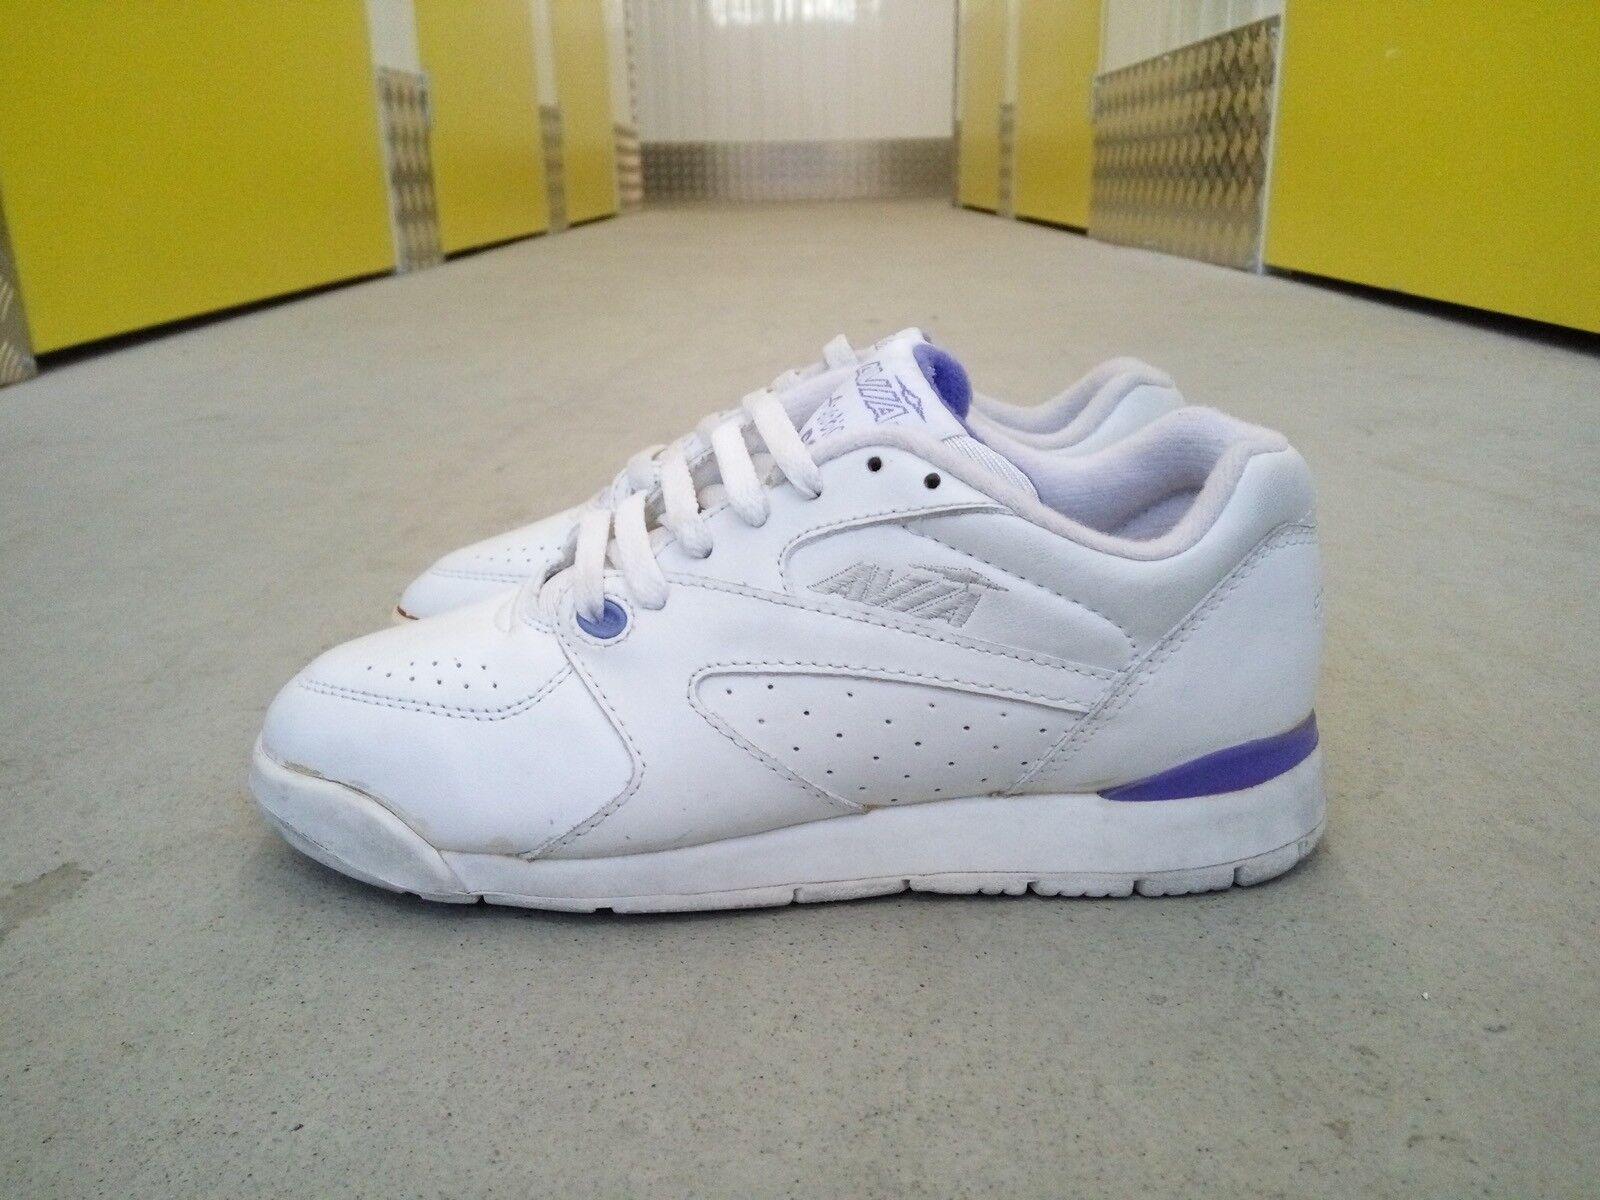 90s AVIA 601 AEROBICS Cantilever Schuhe True True True Vintage Reebok Freestyle Dance Apc a21796